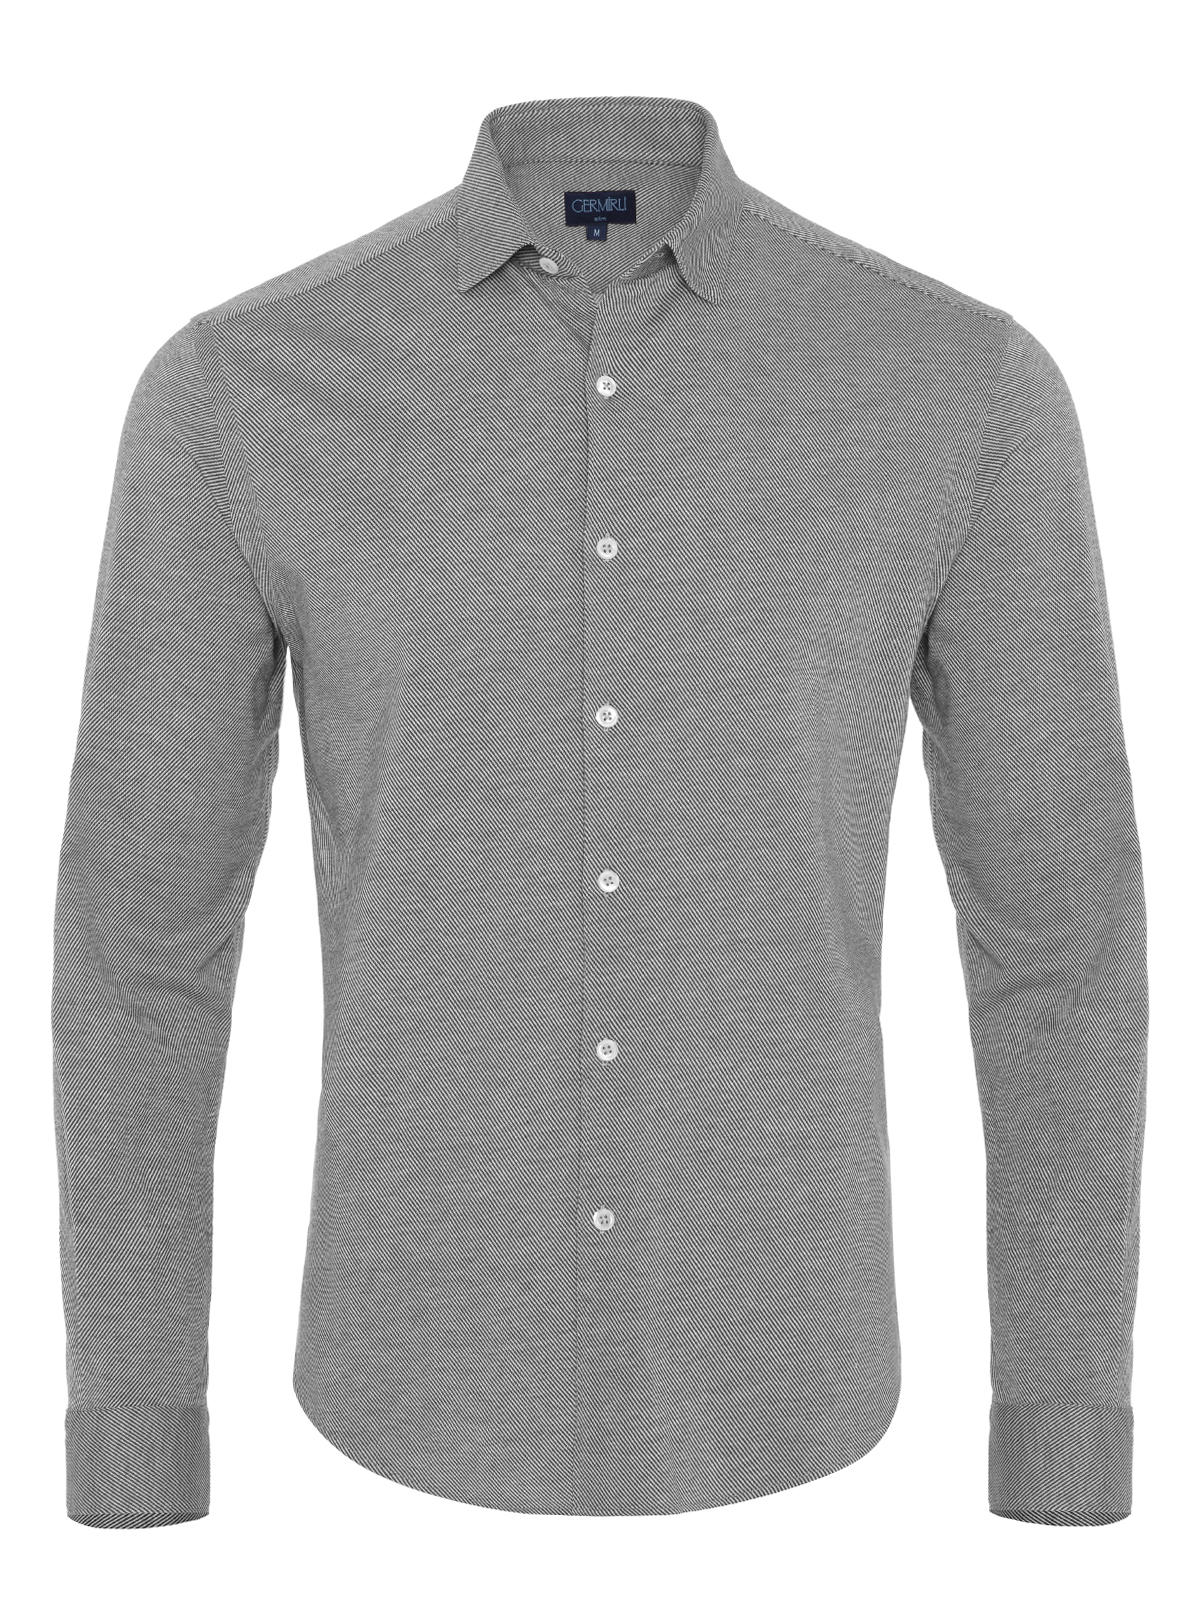 Germirli Gri Twill Penye Klasik Yaka Örme Slim Fit Gömlek